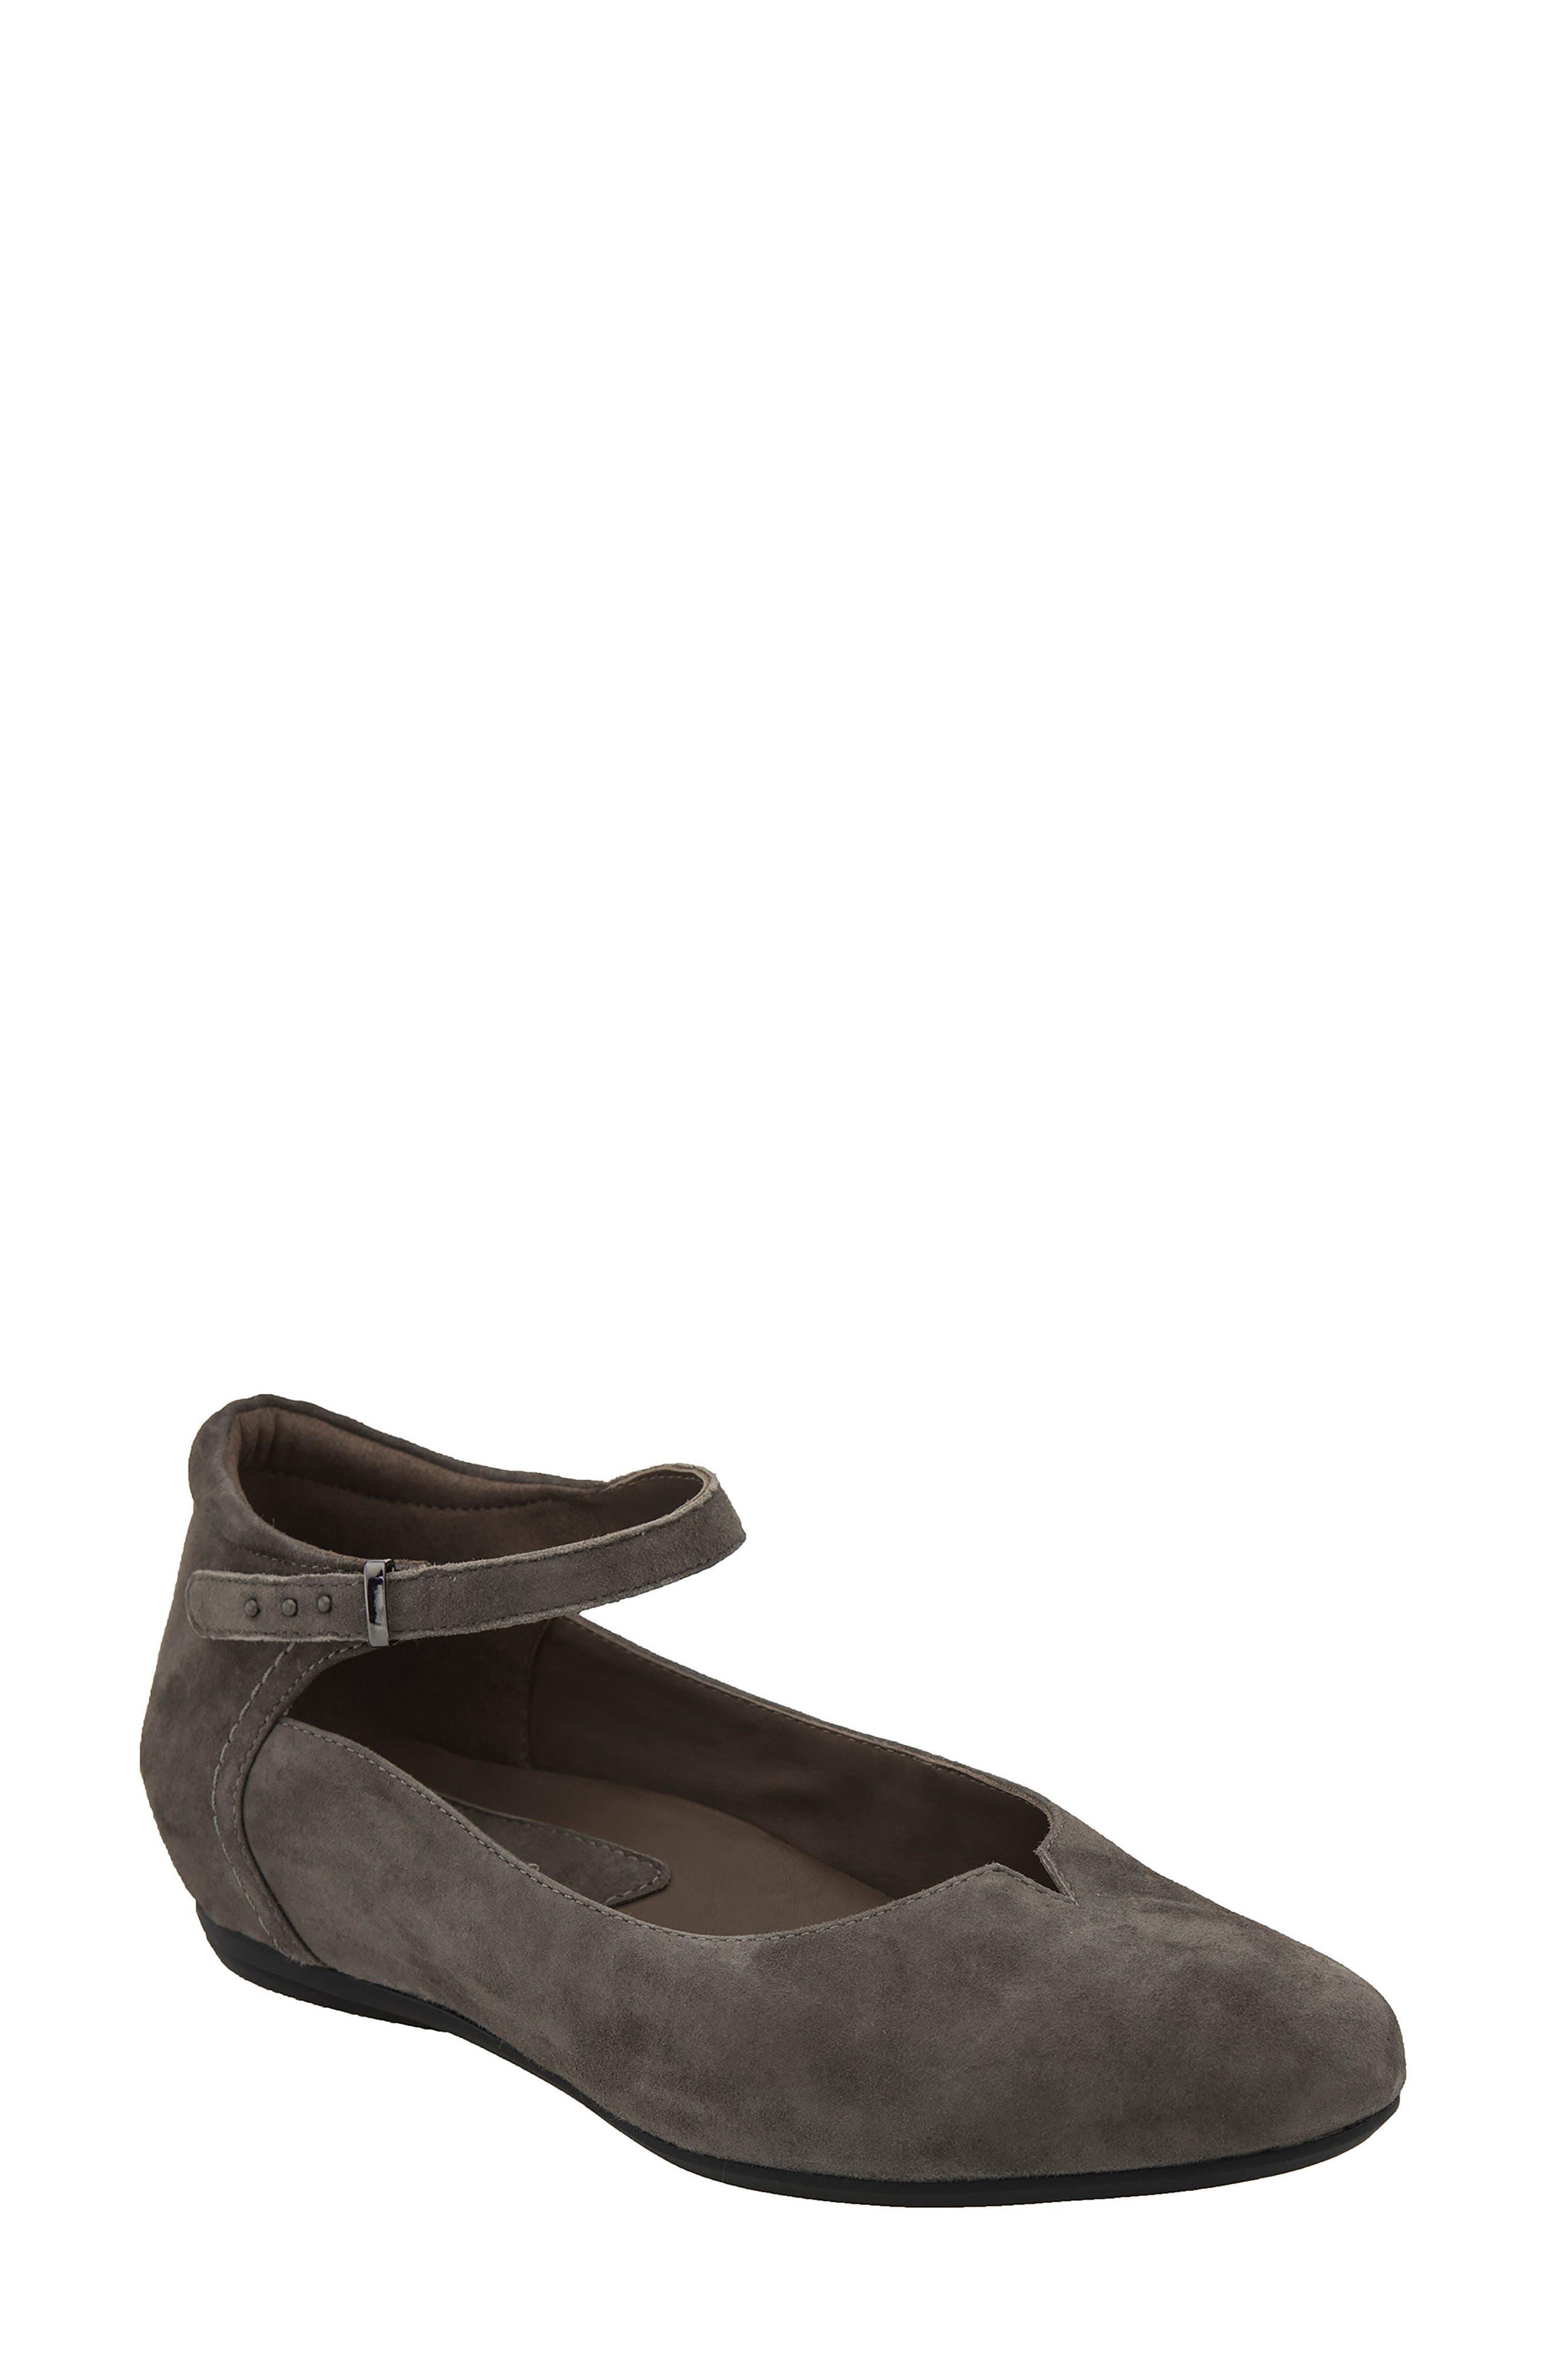 Main Image - Earthies® Emery Ankle Strap Flat (Women)